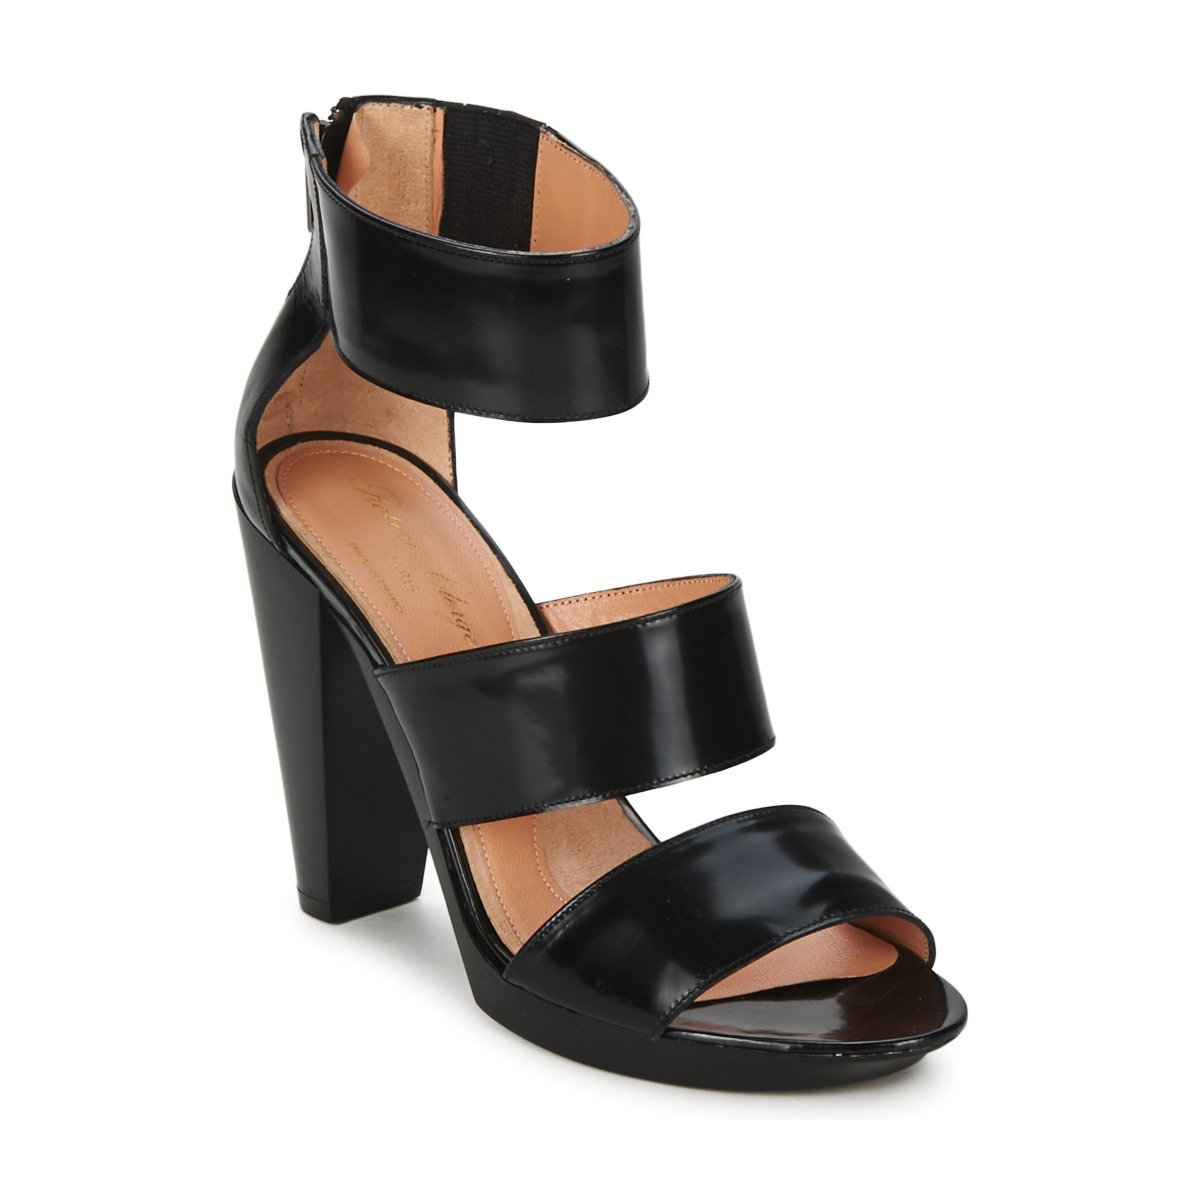 Sandale Robert Clergerie XIMA Noir